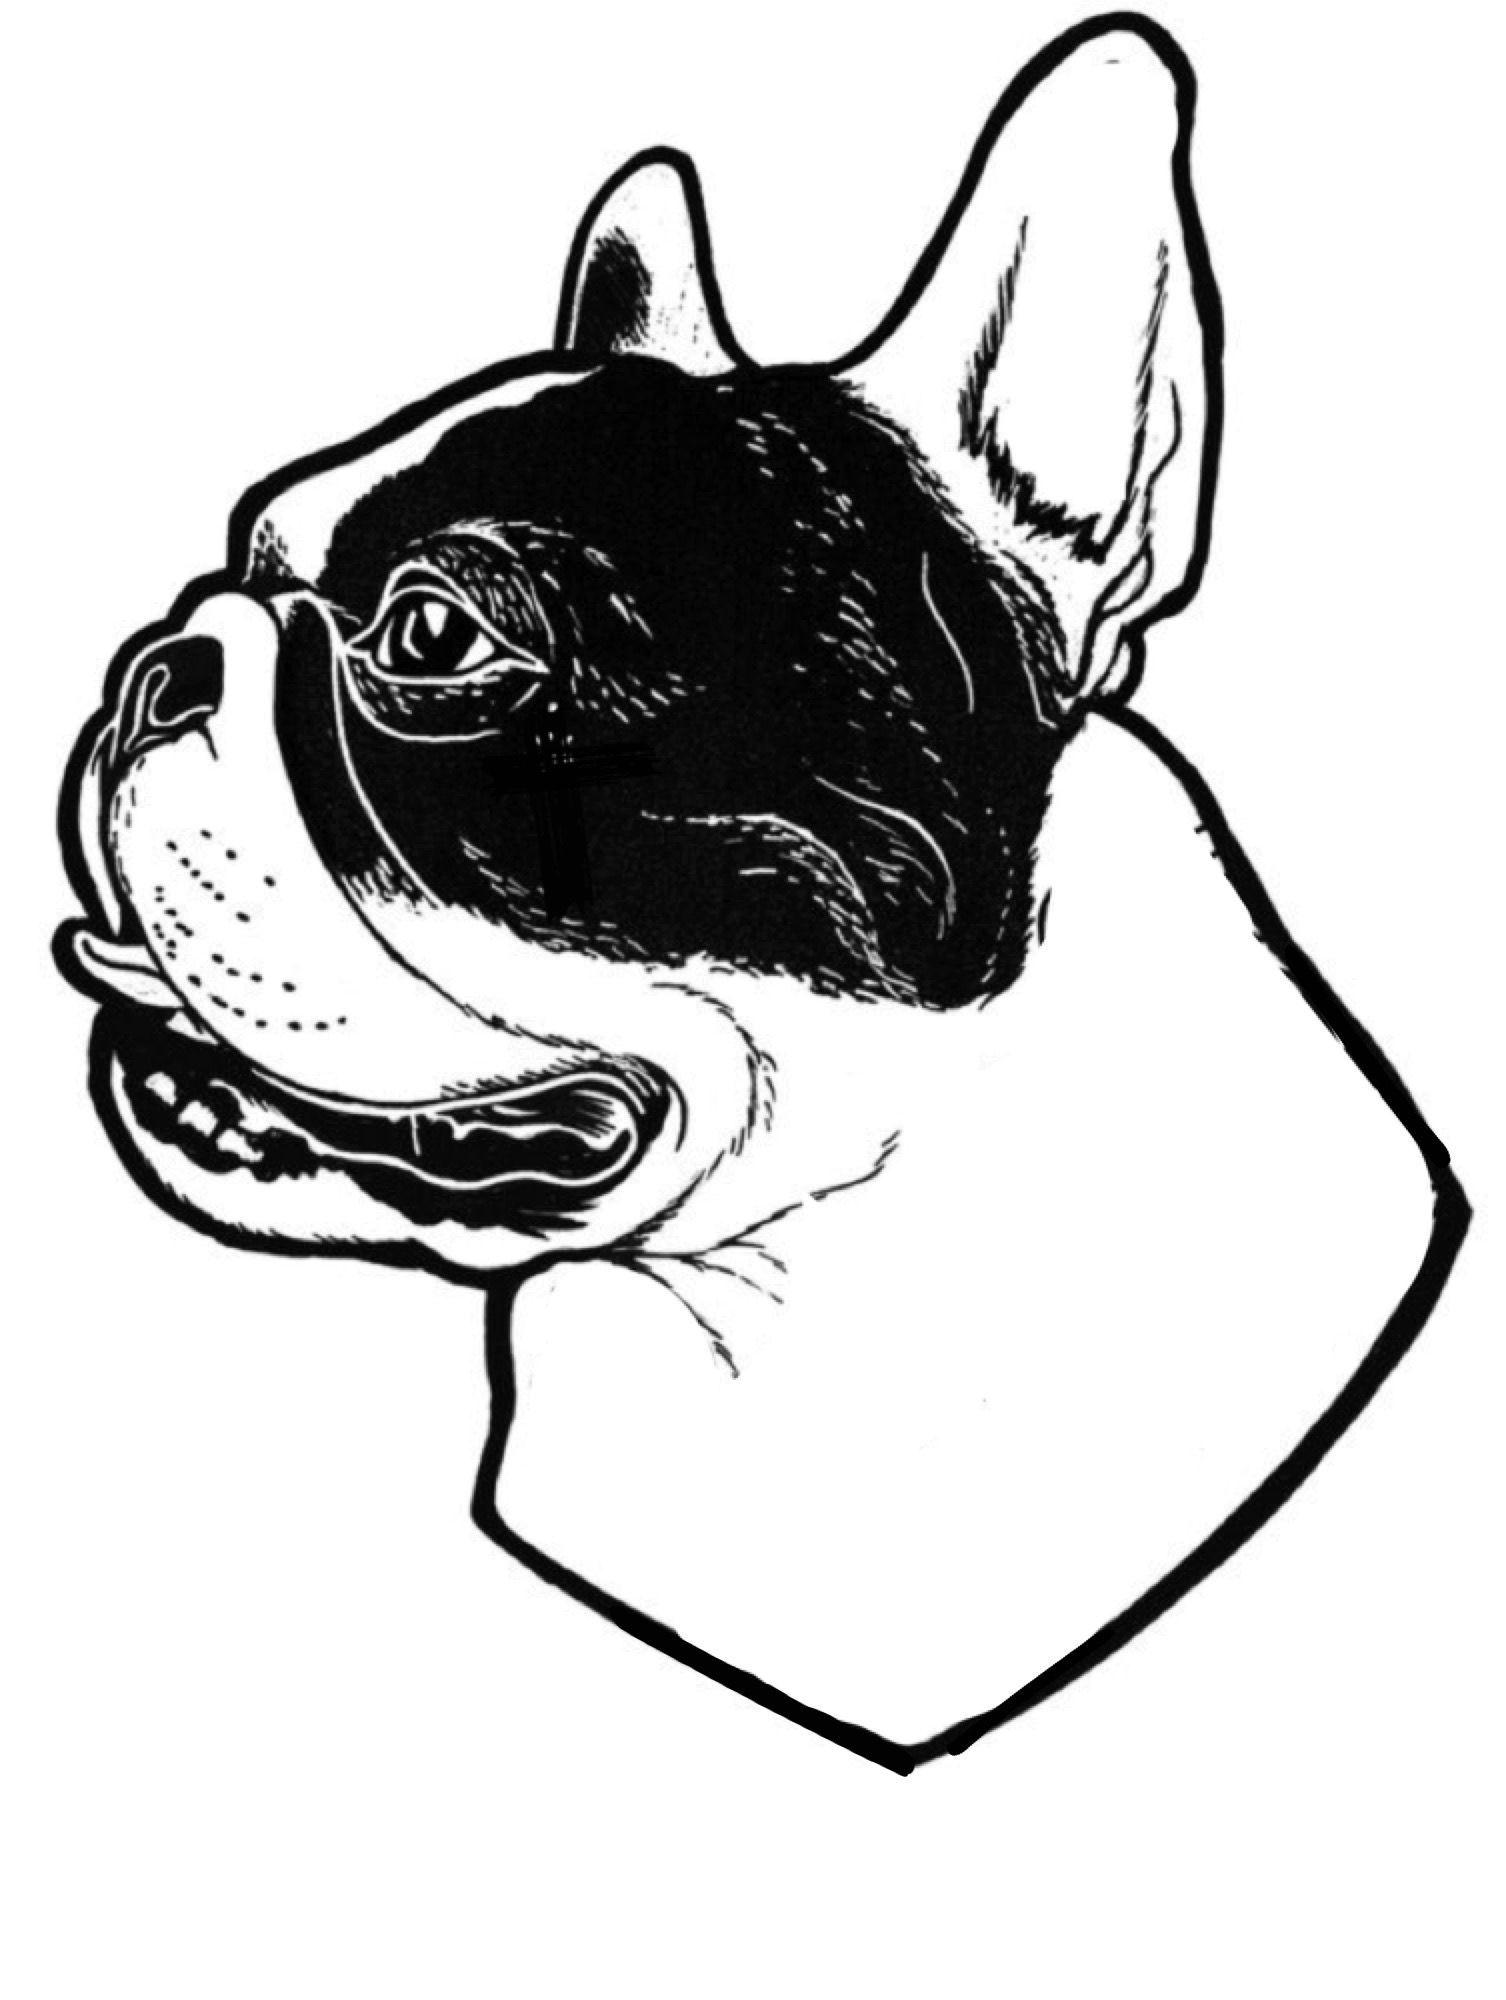 Look - Stencil Bulldog pictures video